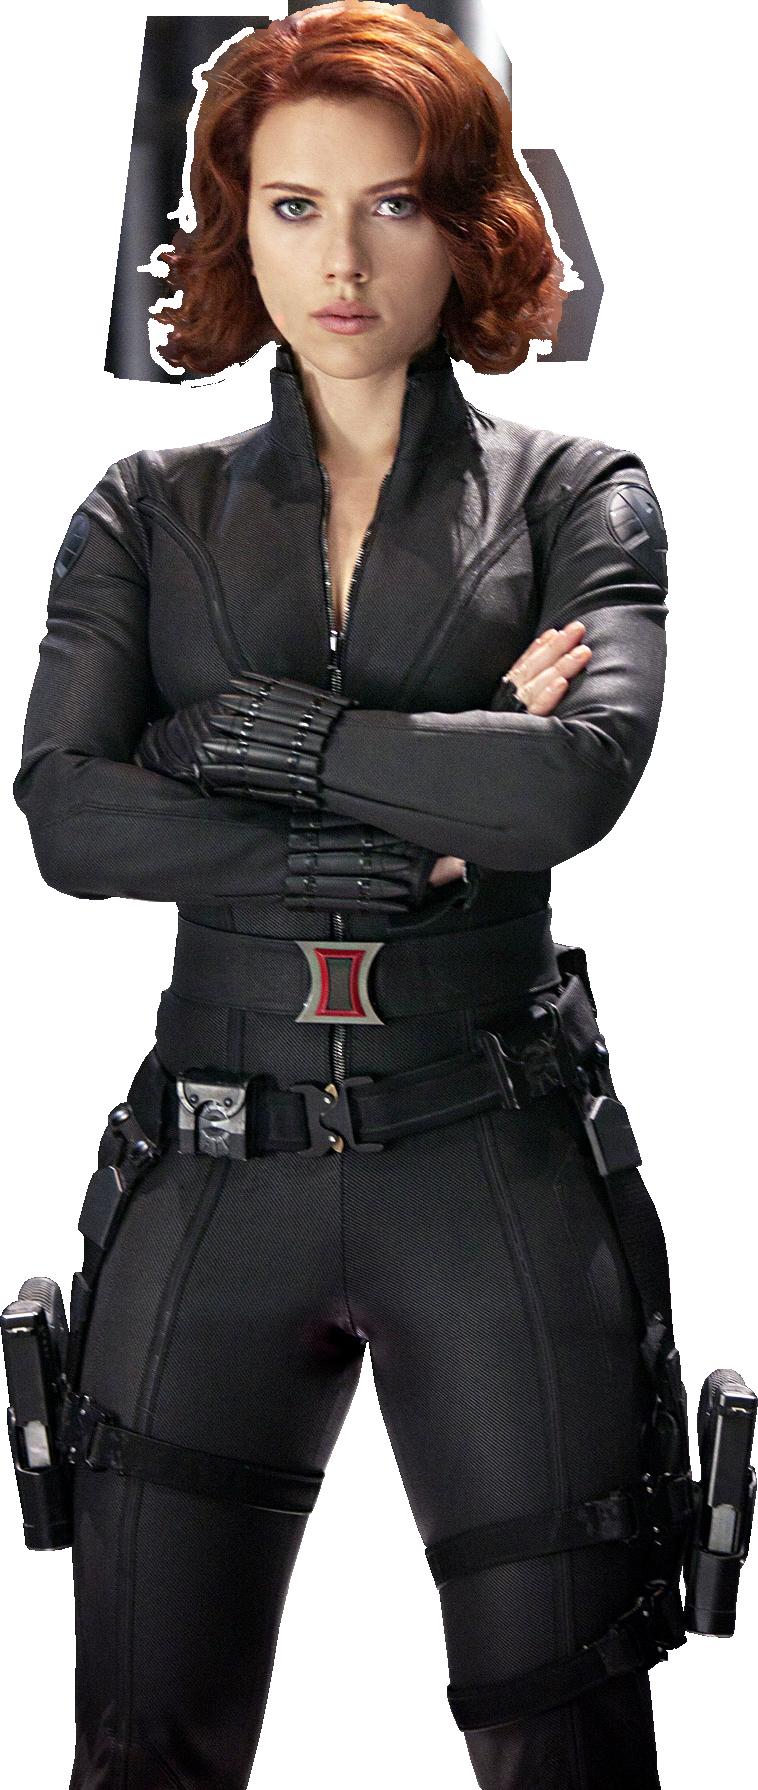 Black Widow PNG Image - Black Widow PNG